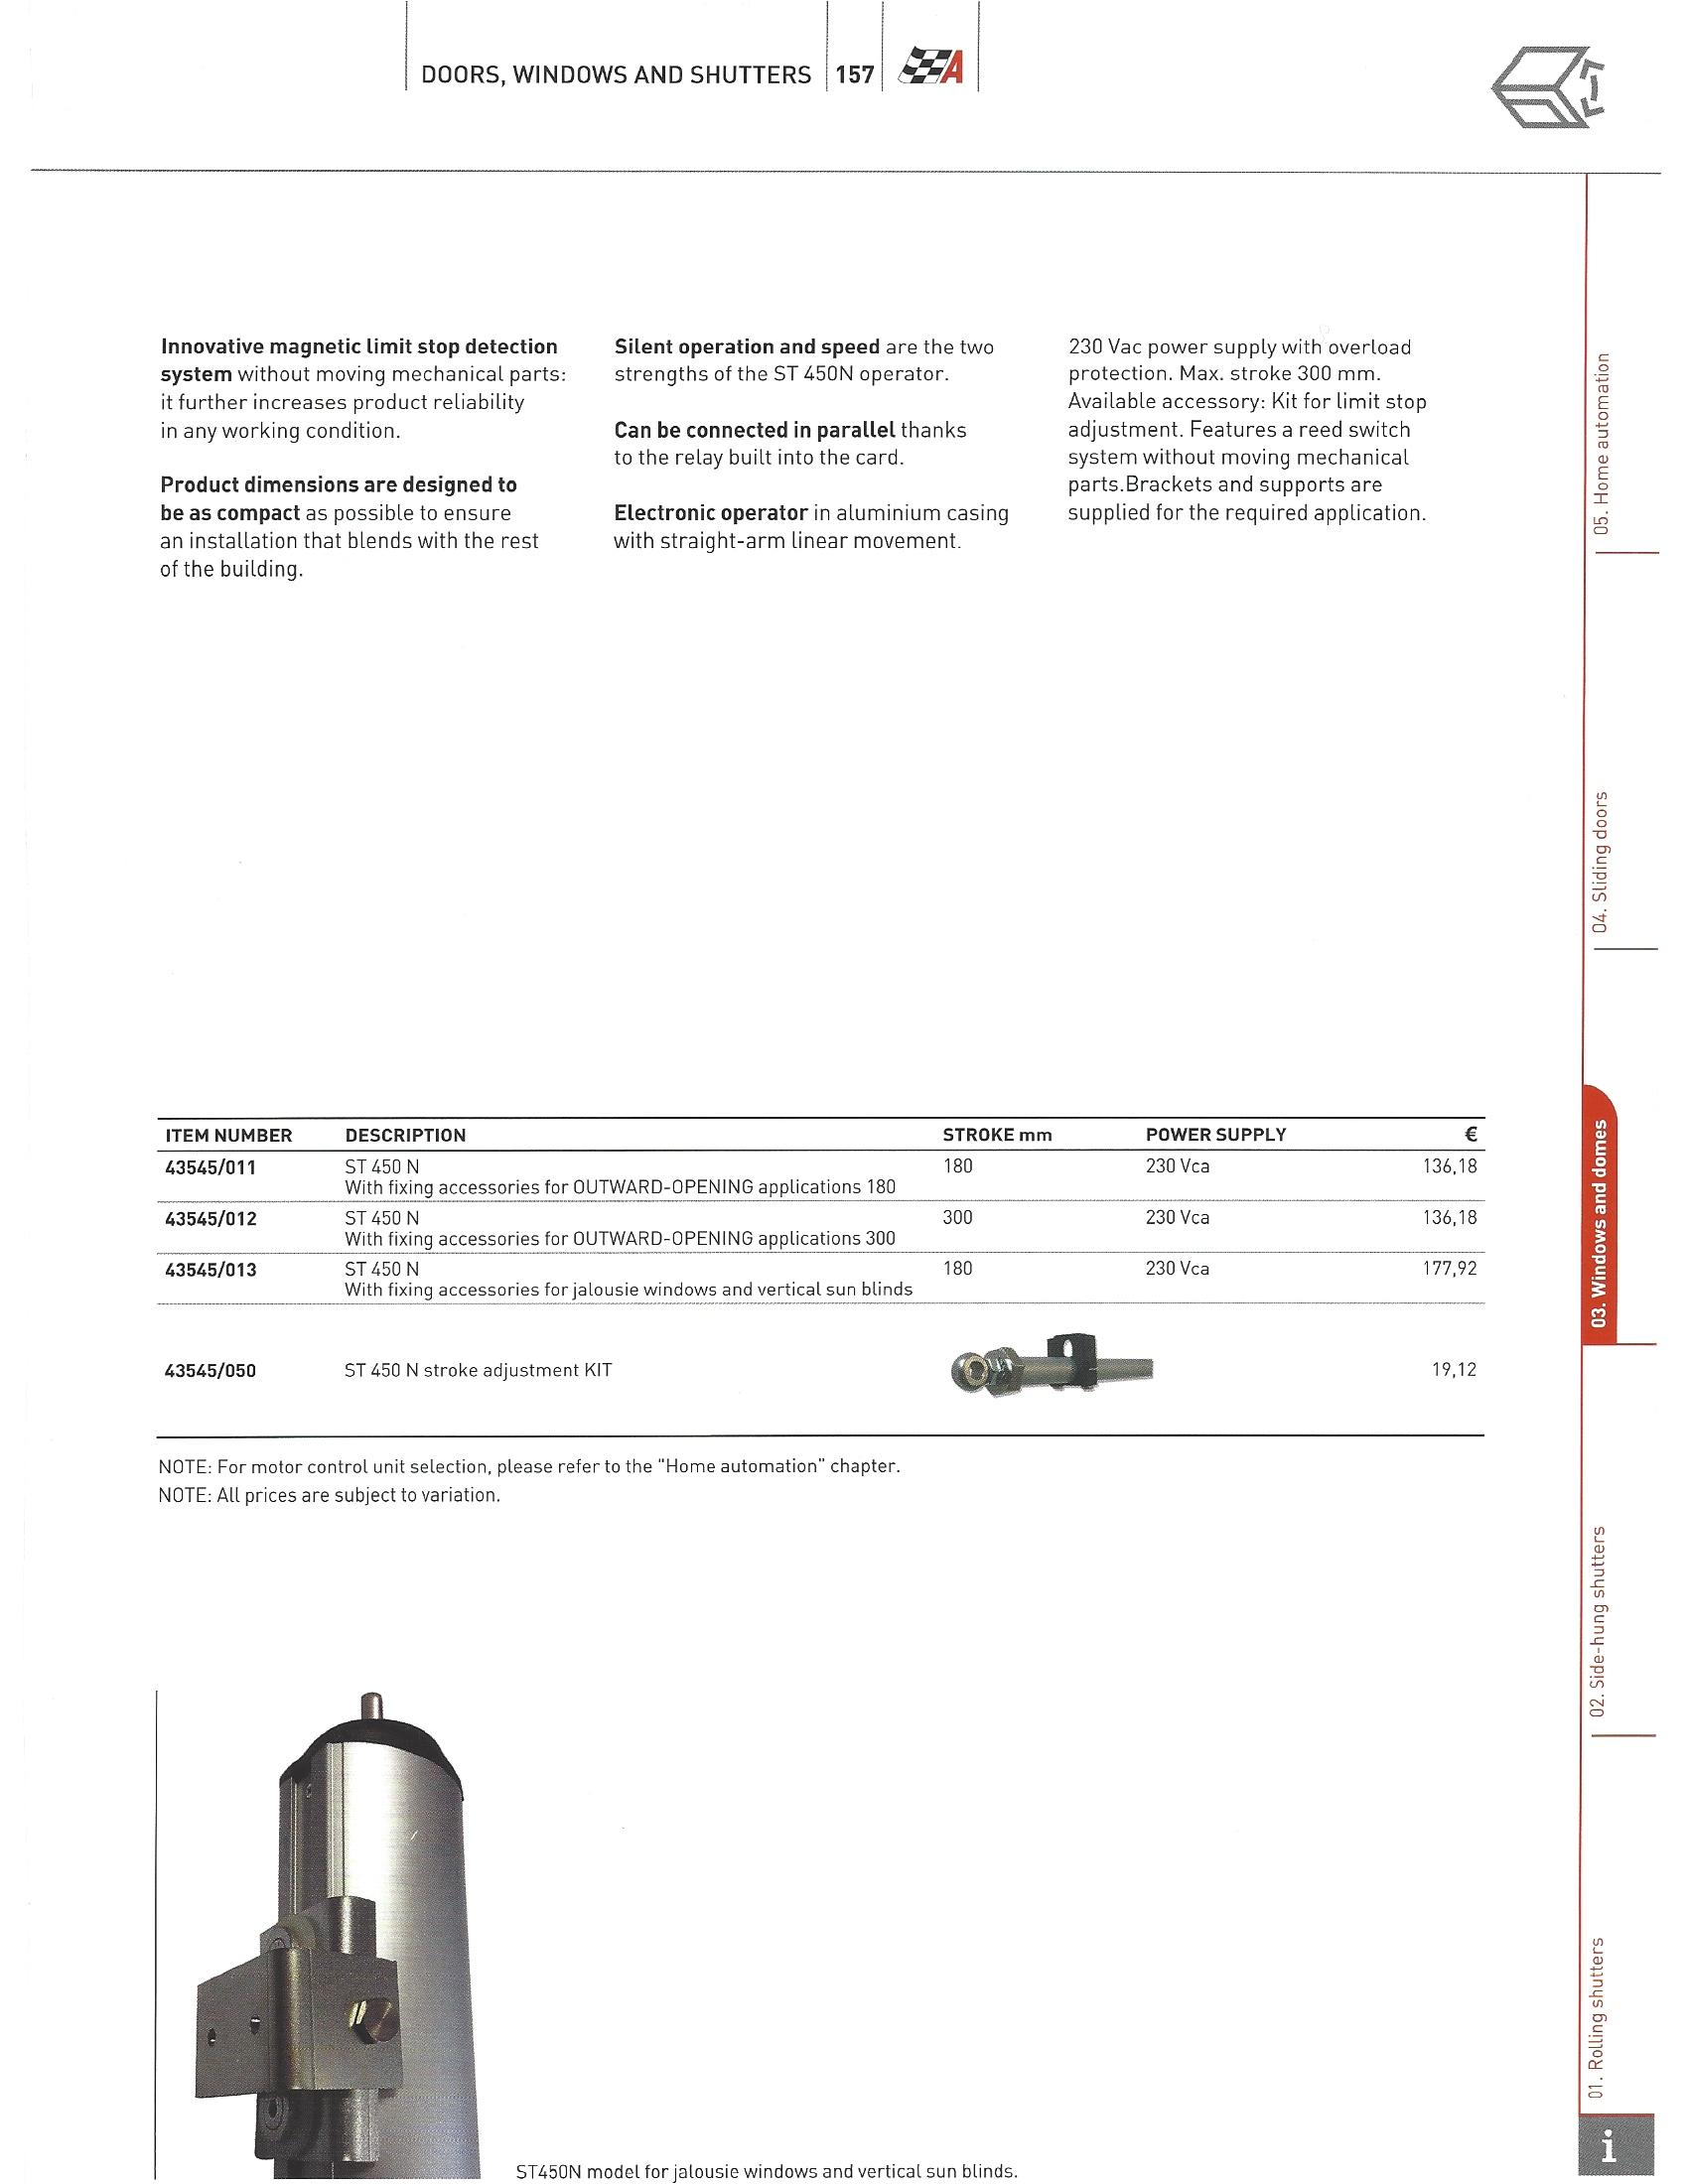 Автоматический электропривод ST 450